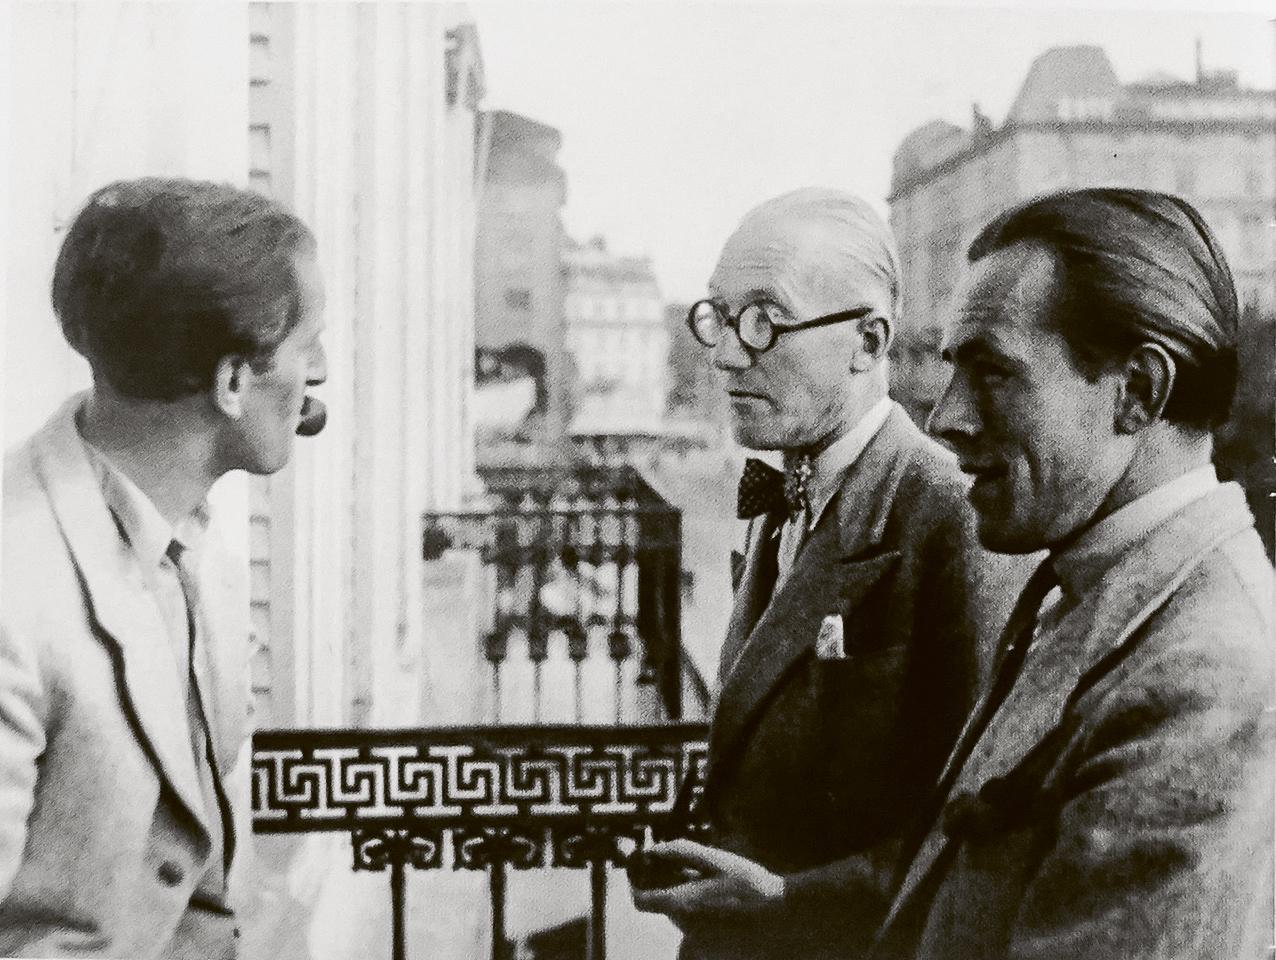 Le Corbusier und Zürich